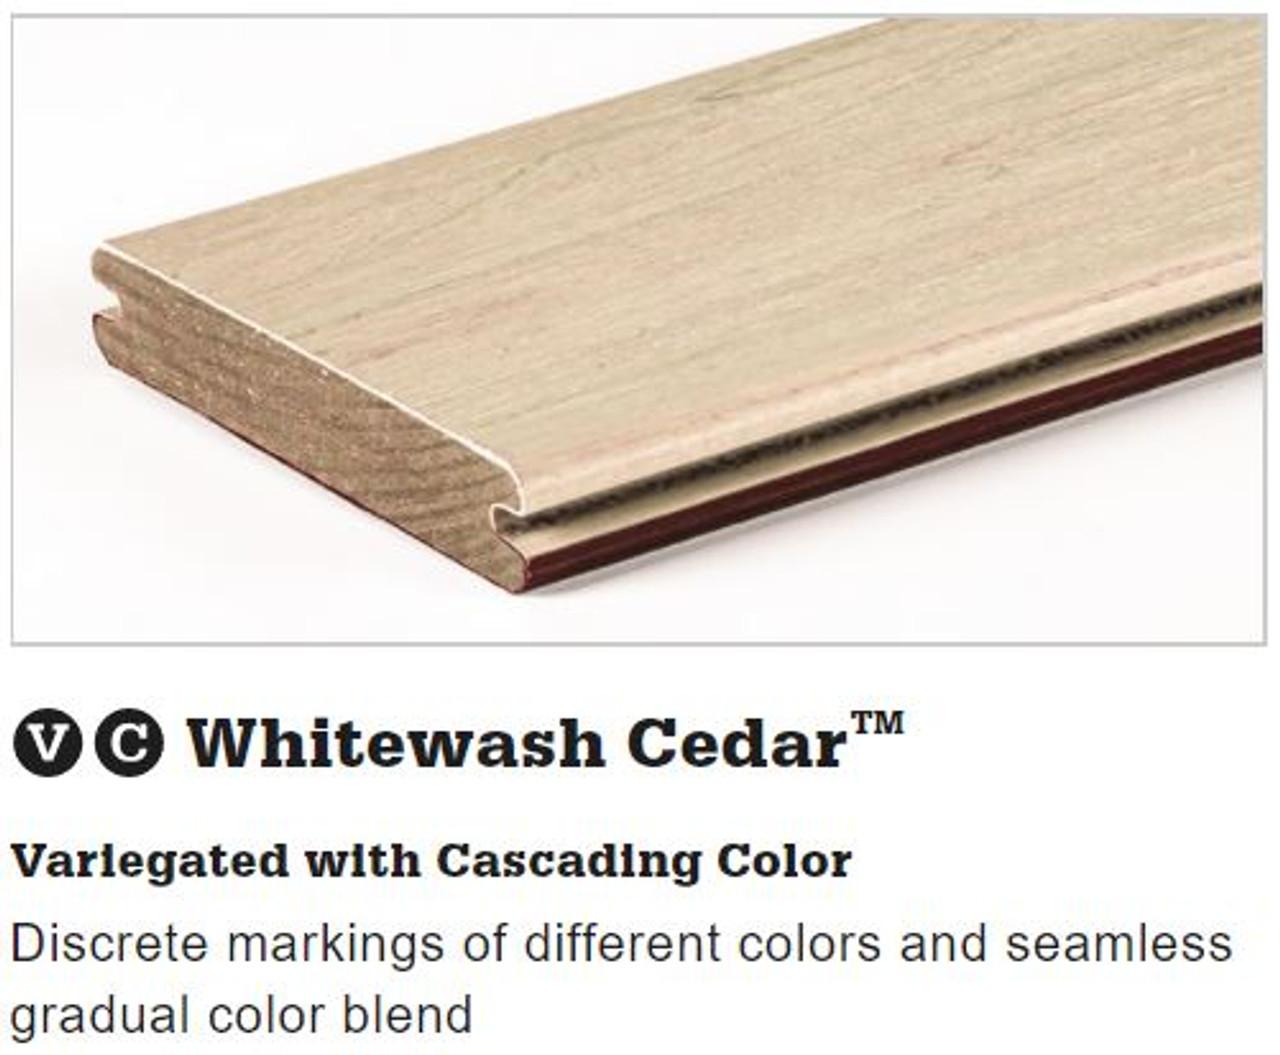 TimberTech Legacy Grooved Decking in Whitewash Cedar